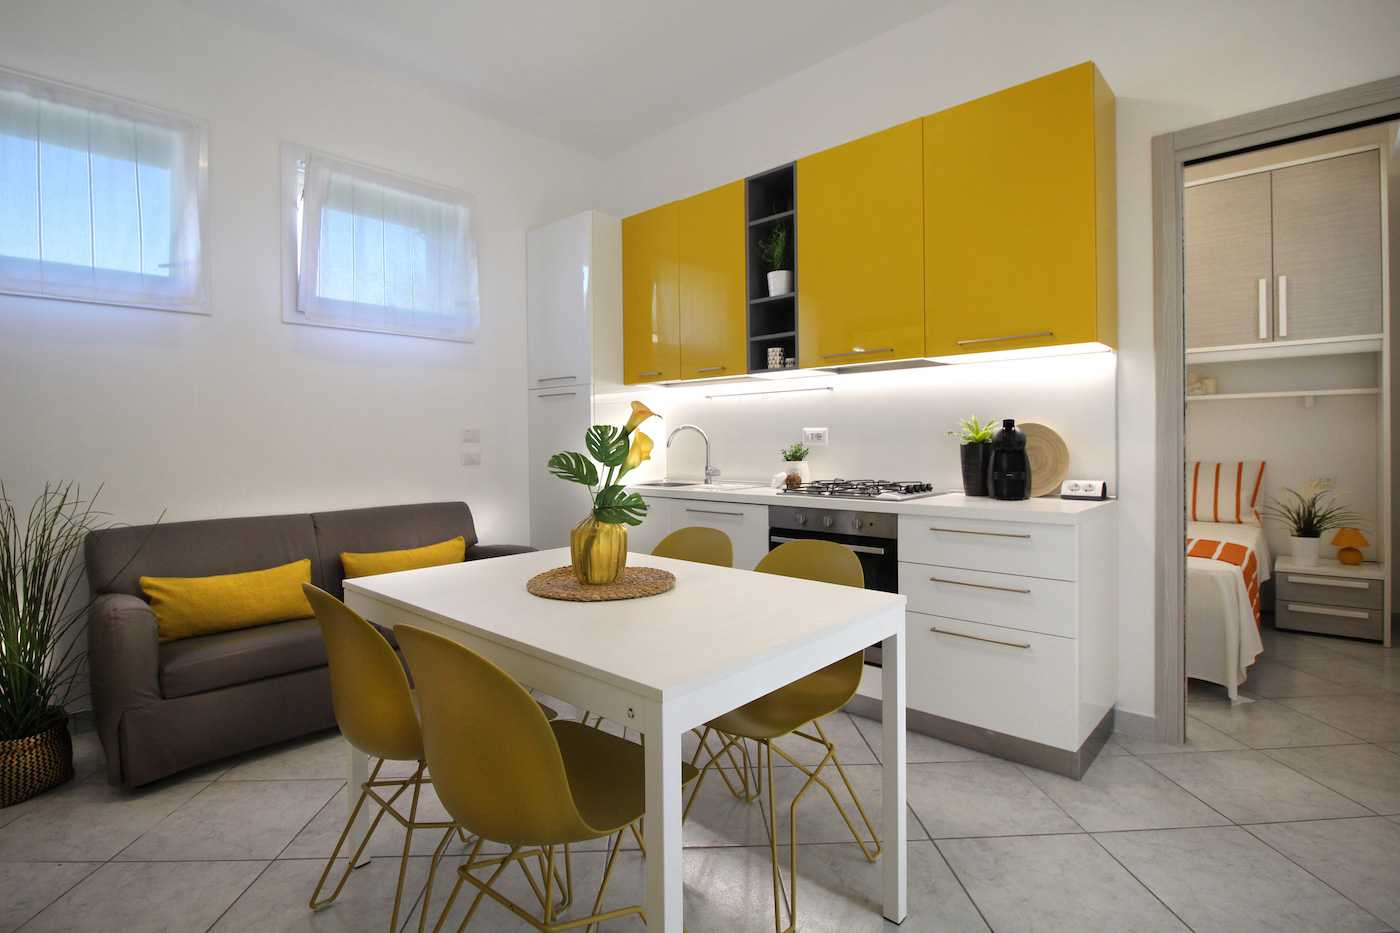 Appartamento Lorenzo_IMG_1658_2_Anteprima